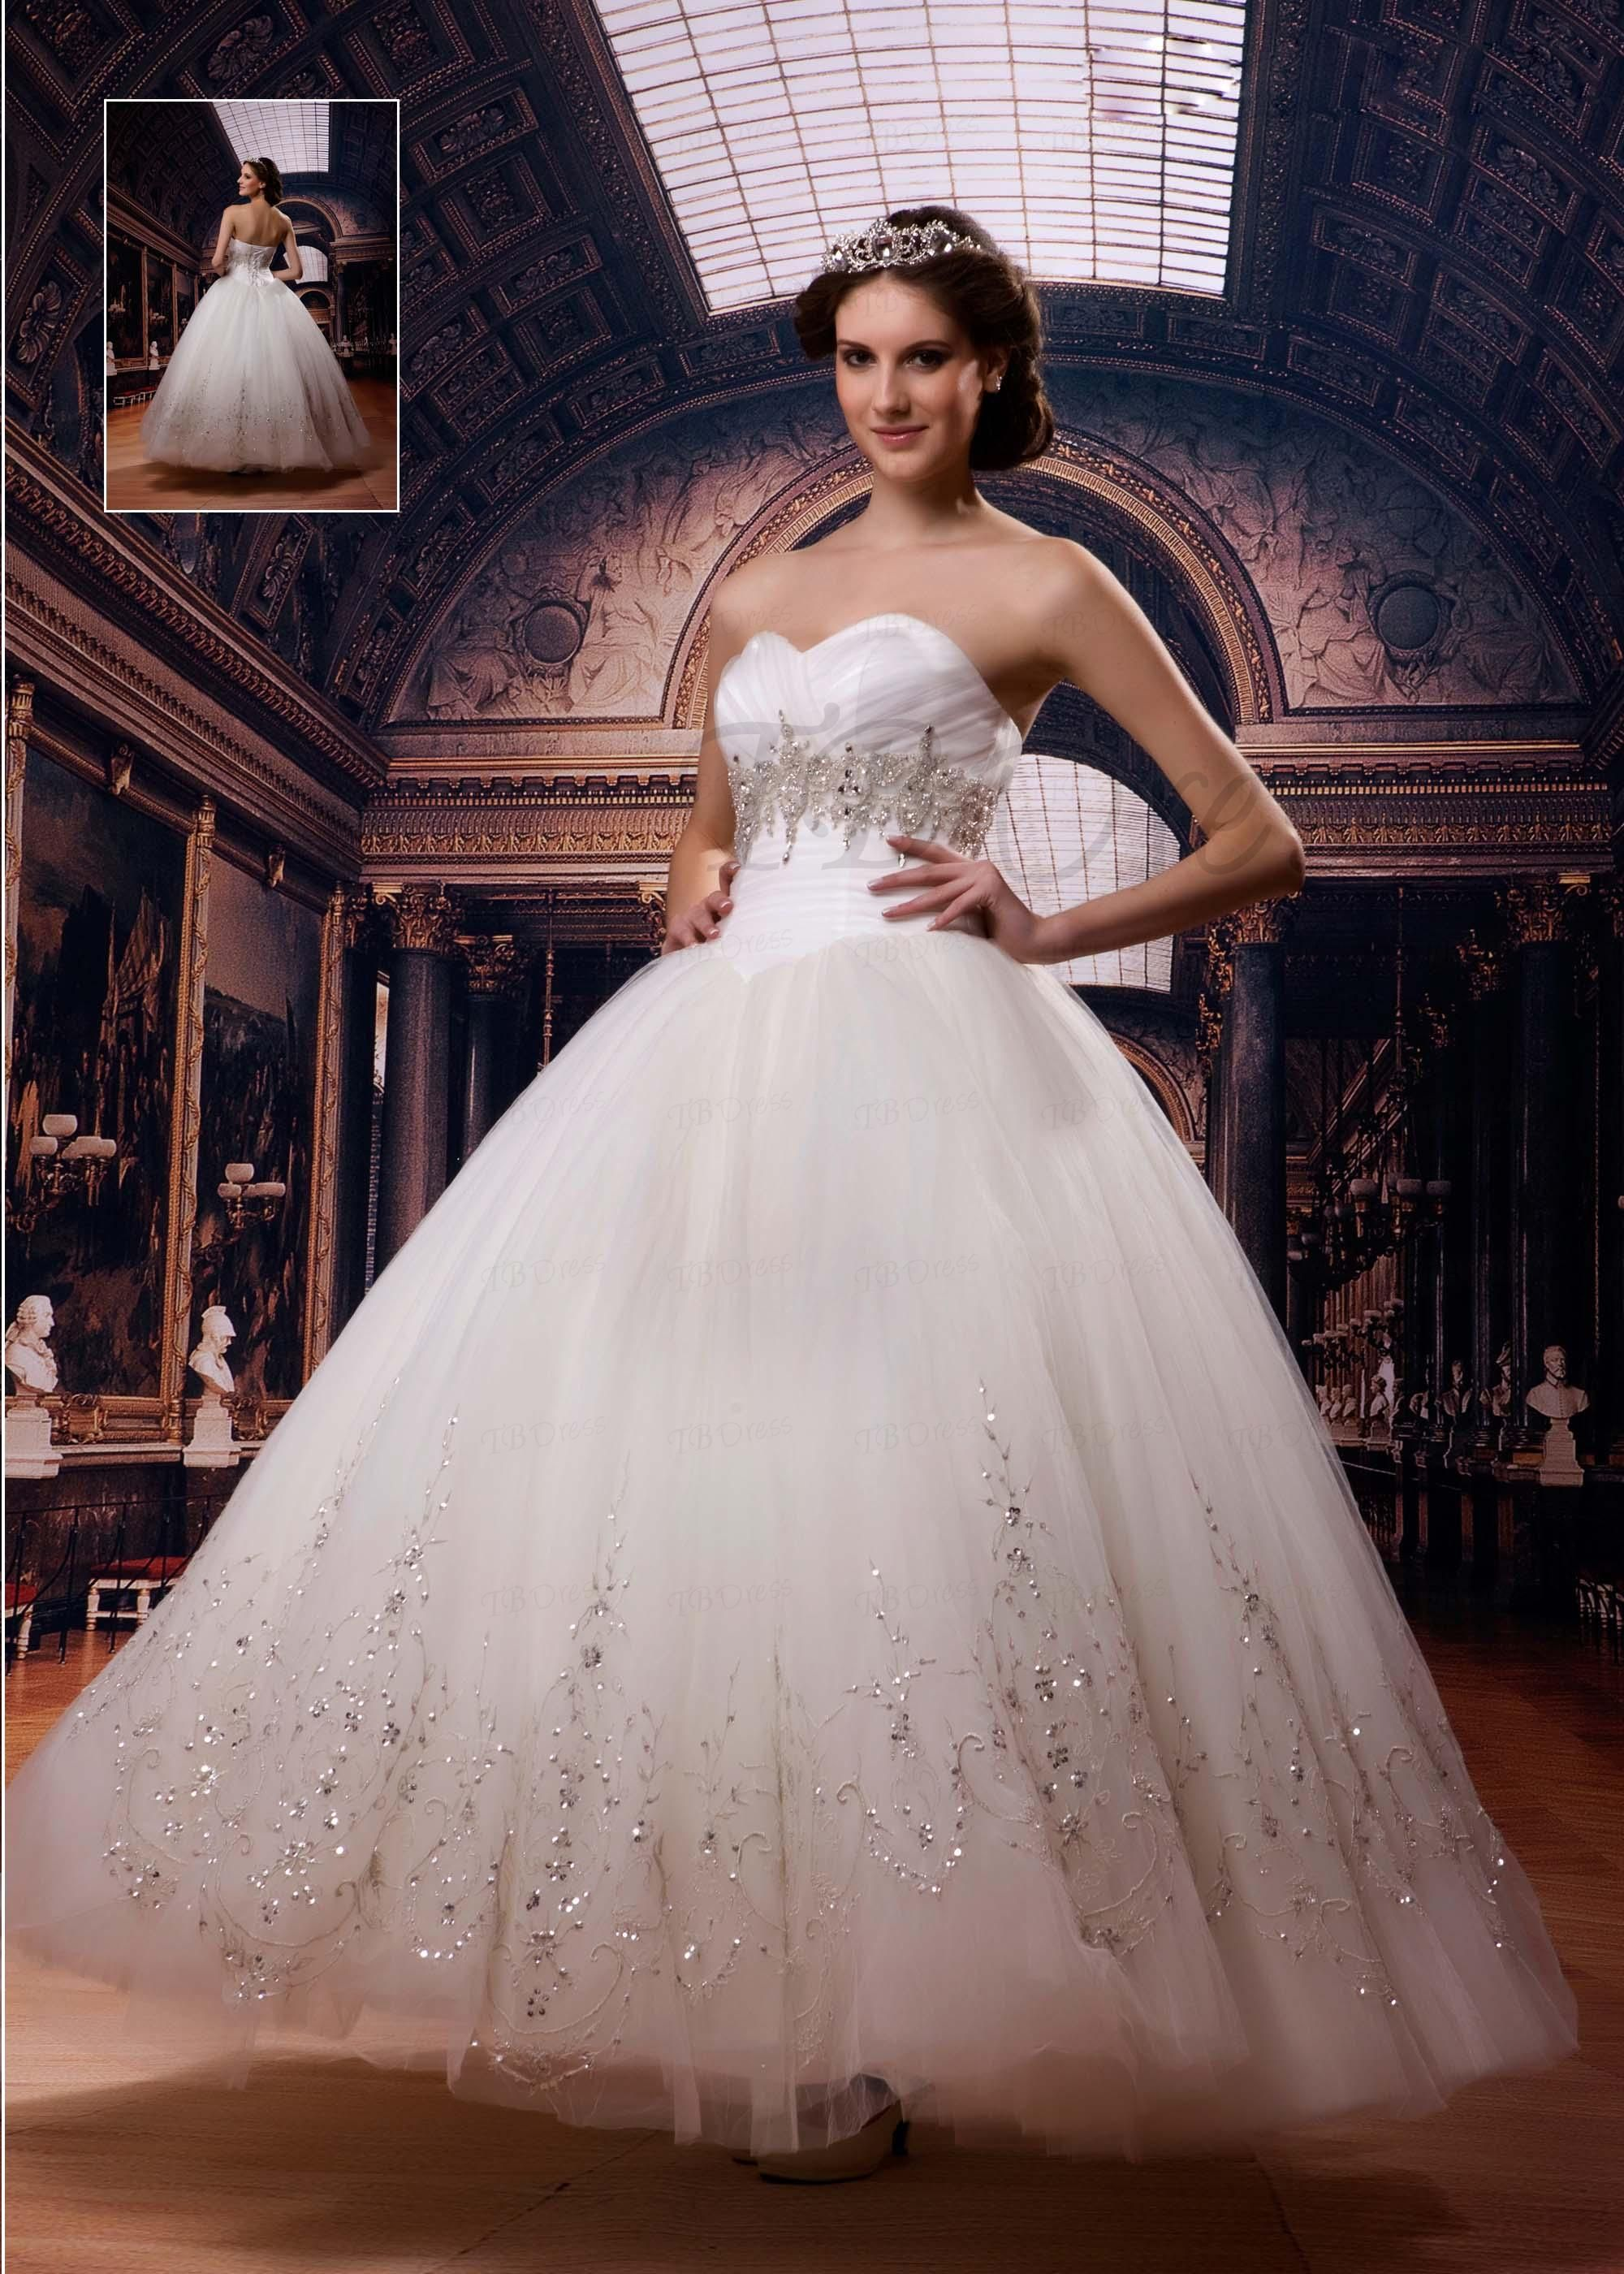 Sweetheart ball gown wedding dress  Ball Gown Sweetheart Ankle Length Beading Wedding Dress  Ball gowns